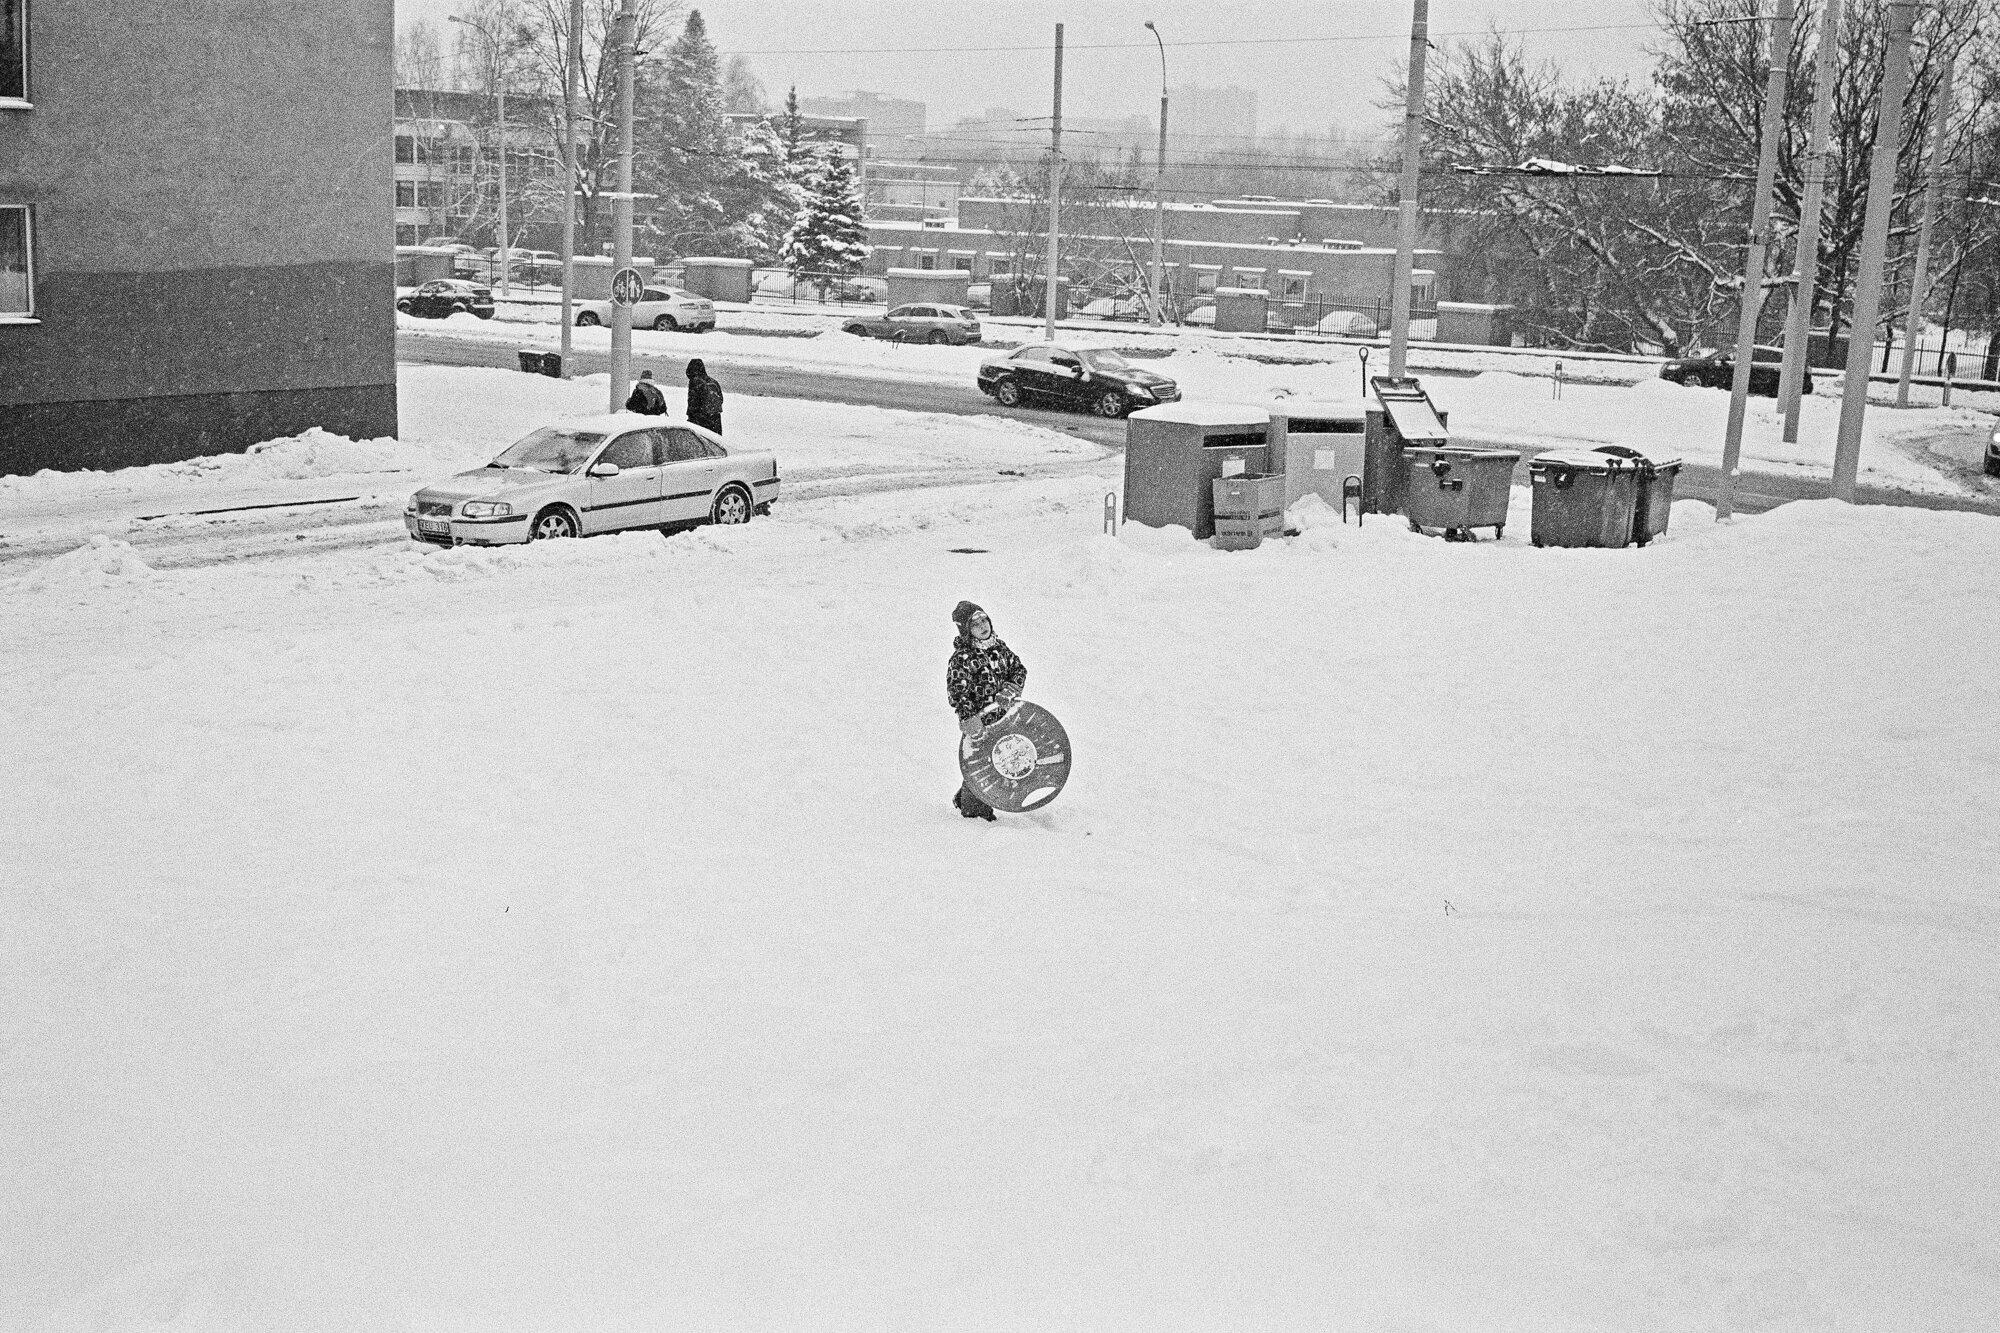 Ignas_Winter-13.jpg